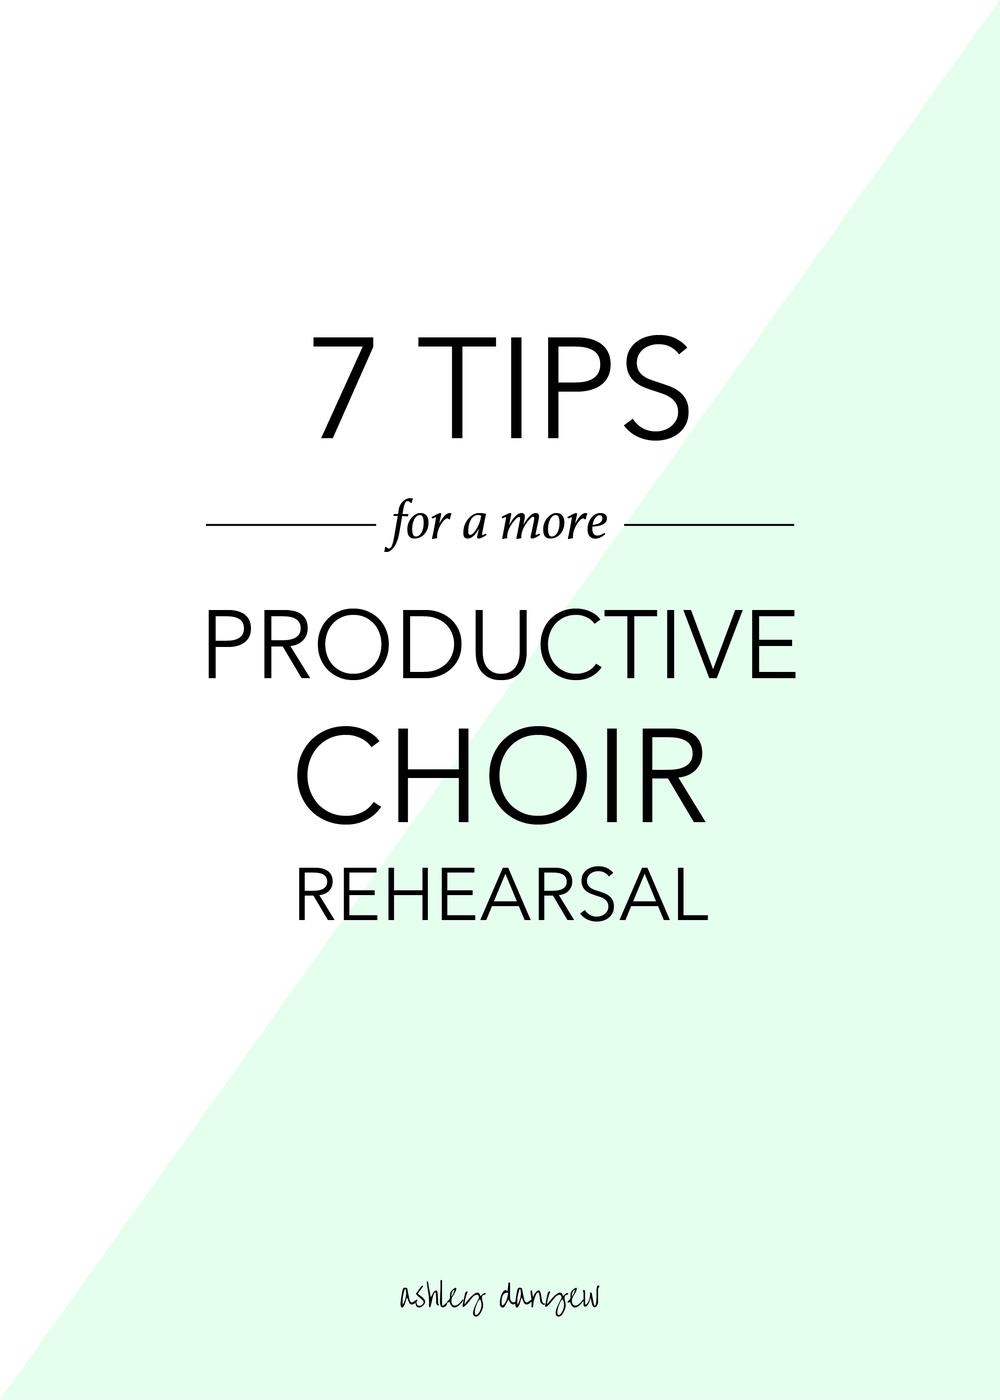 Copy of 7 Tips for a Productive Choir Rehearsal